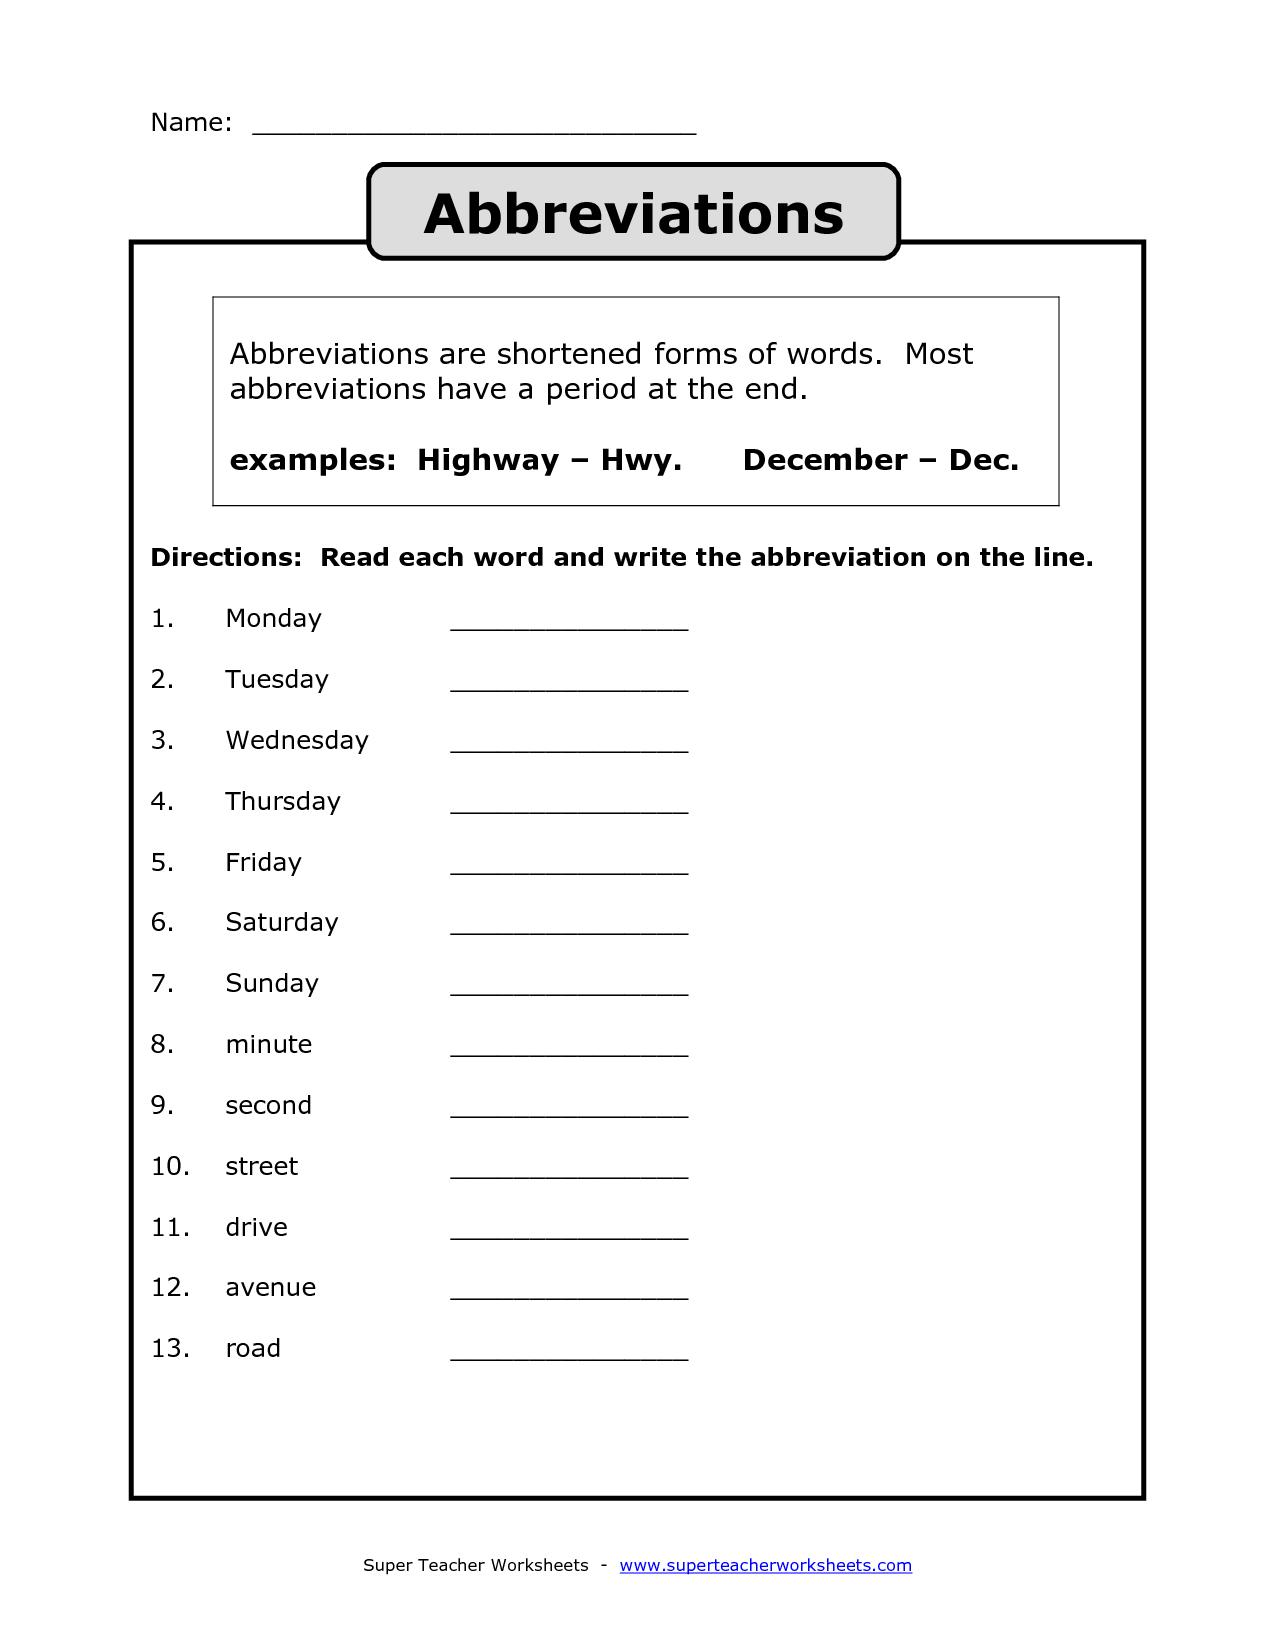 Abbreviation Worksheet Printable